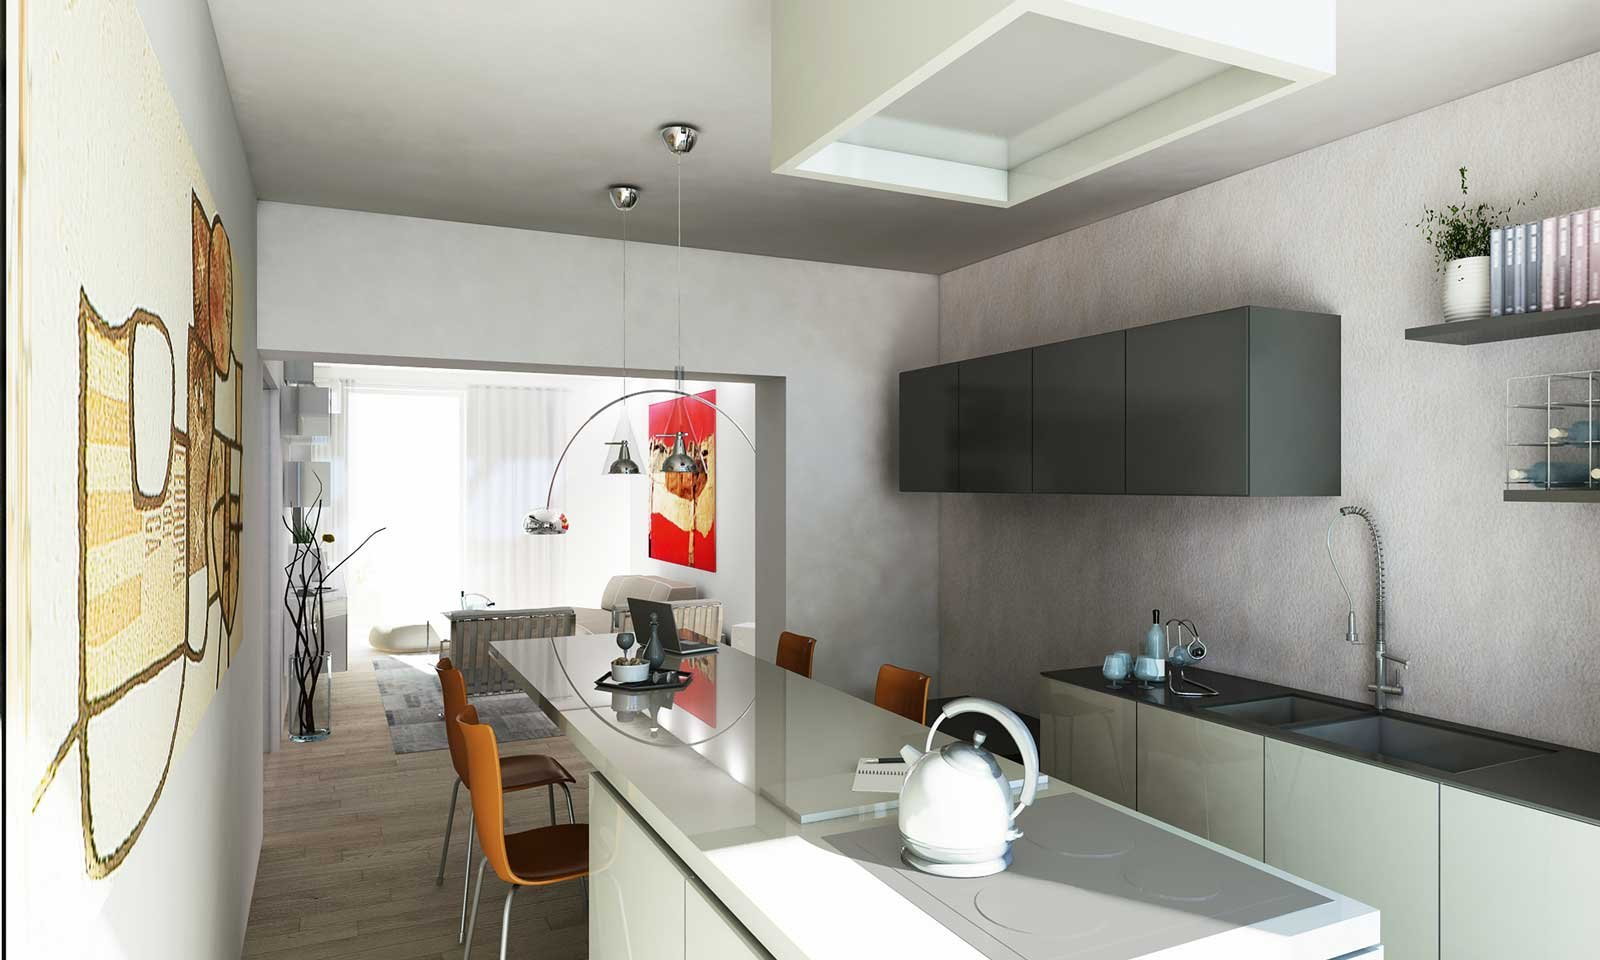 Camera Ospiti Per Vano Cucina : Mobili geniali per piccole case casafacile